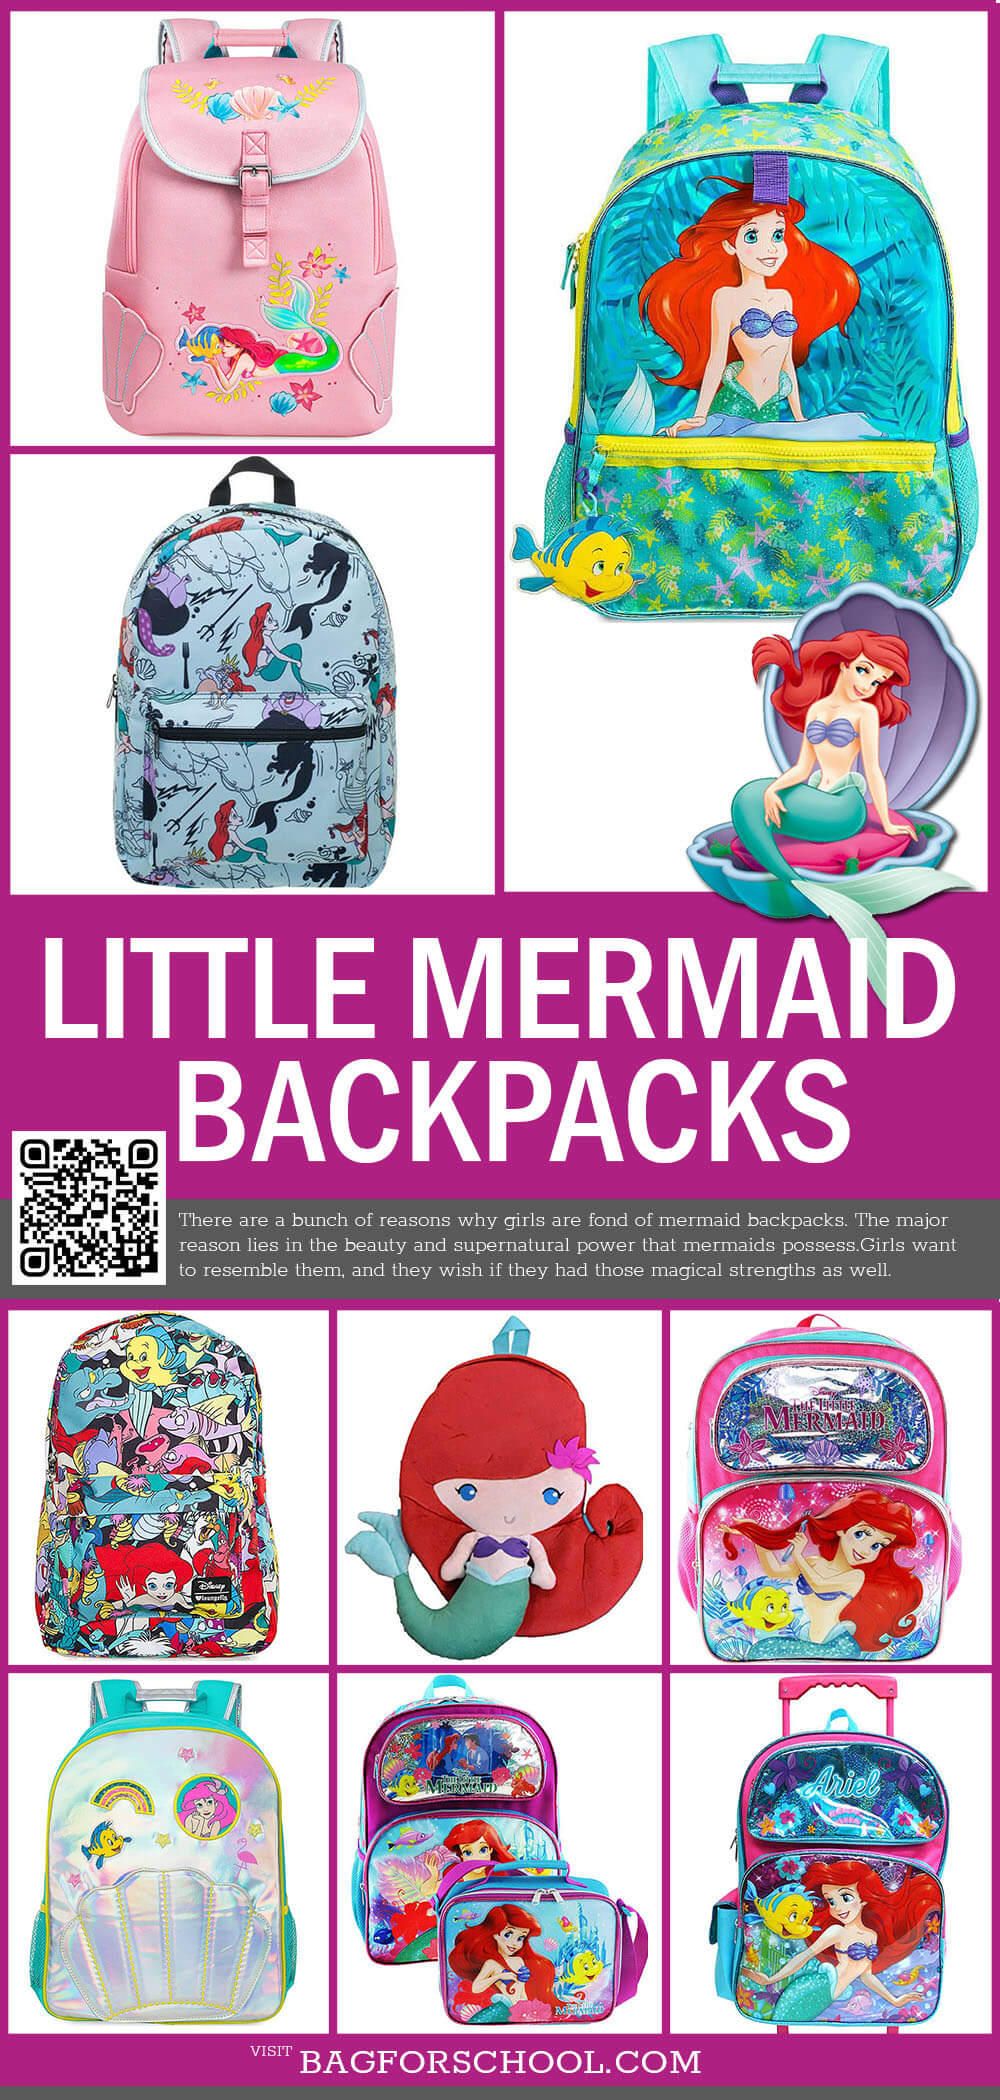 Little Mermaid Backpacks